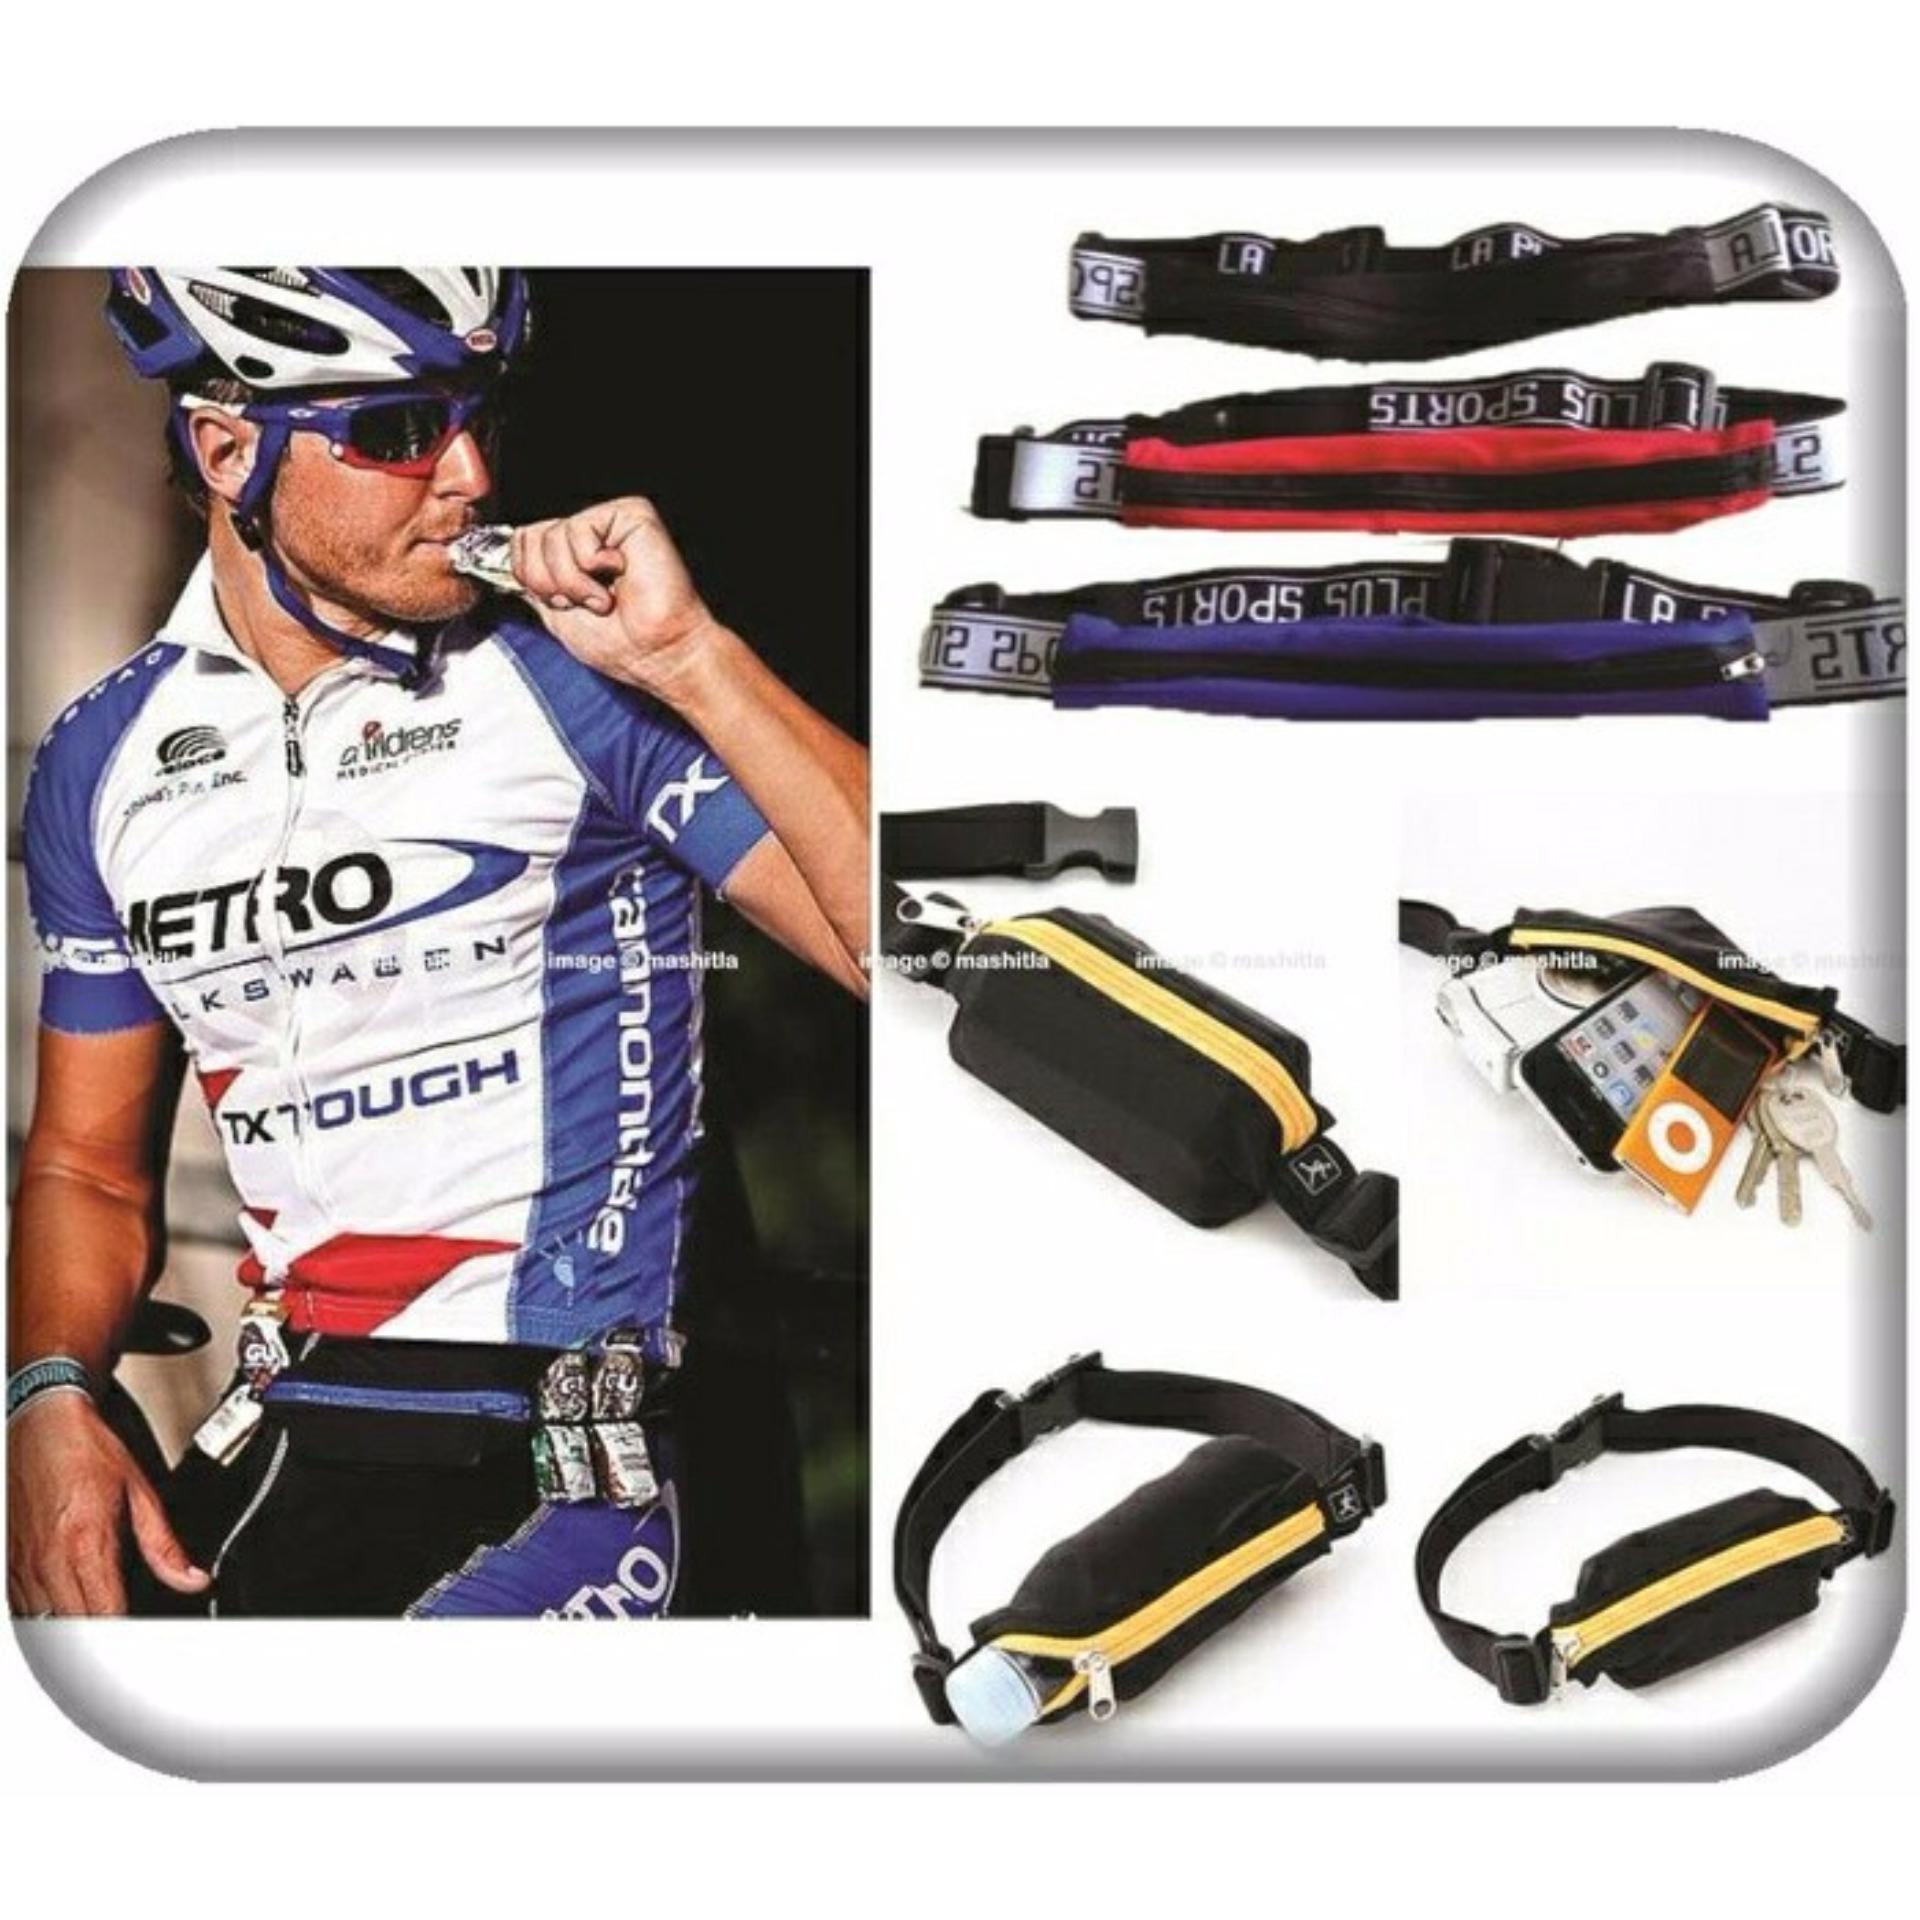 GO BELT BREWYN- belt/ikat pinggang multifungsi untuk sport/travelling - SOLID BLUE